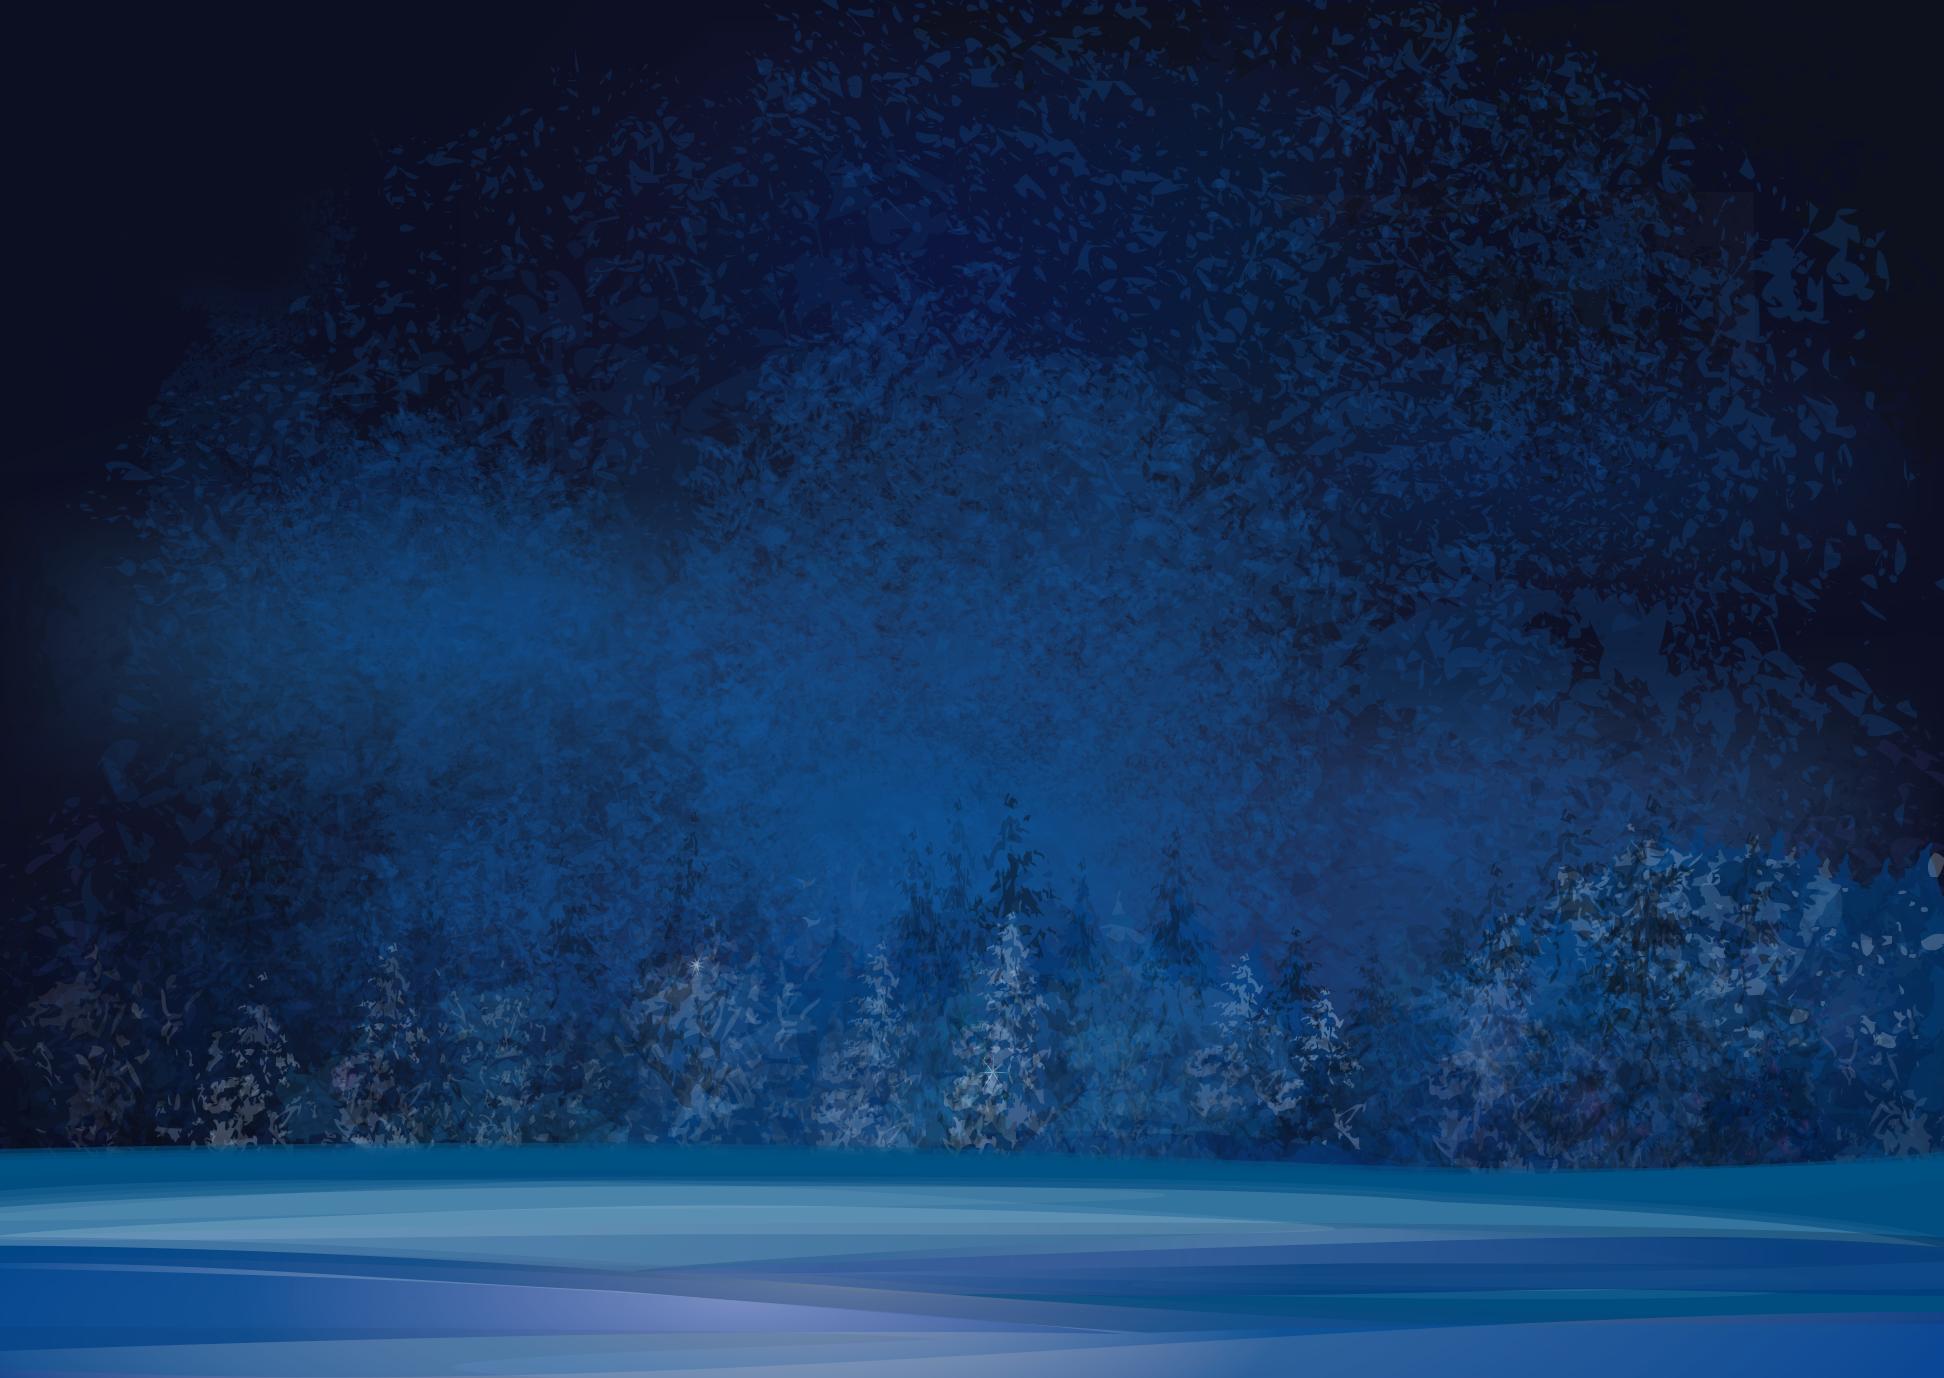 winter-bg-no-stars-no-moon.png